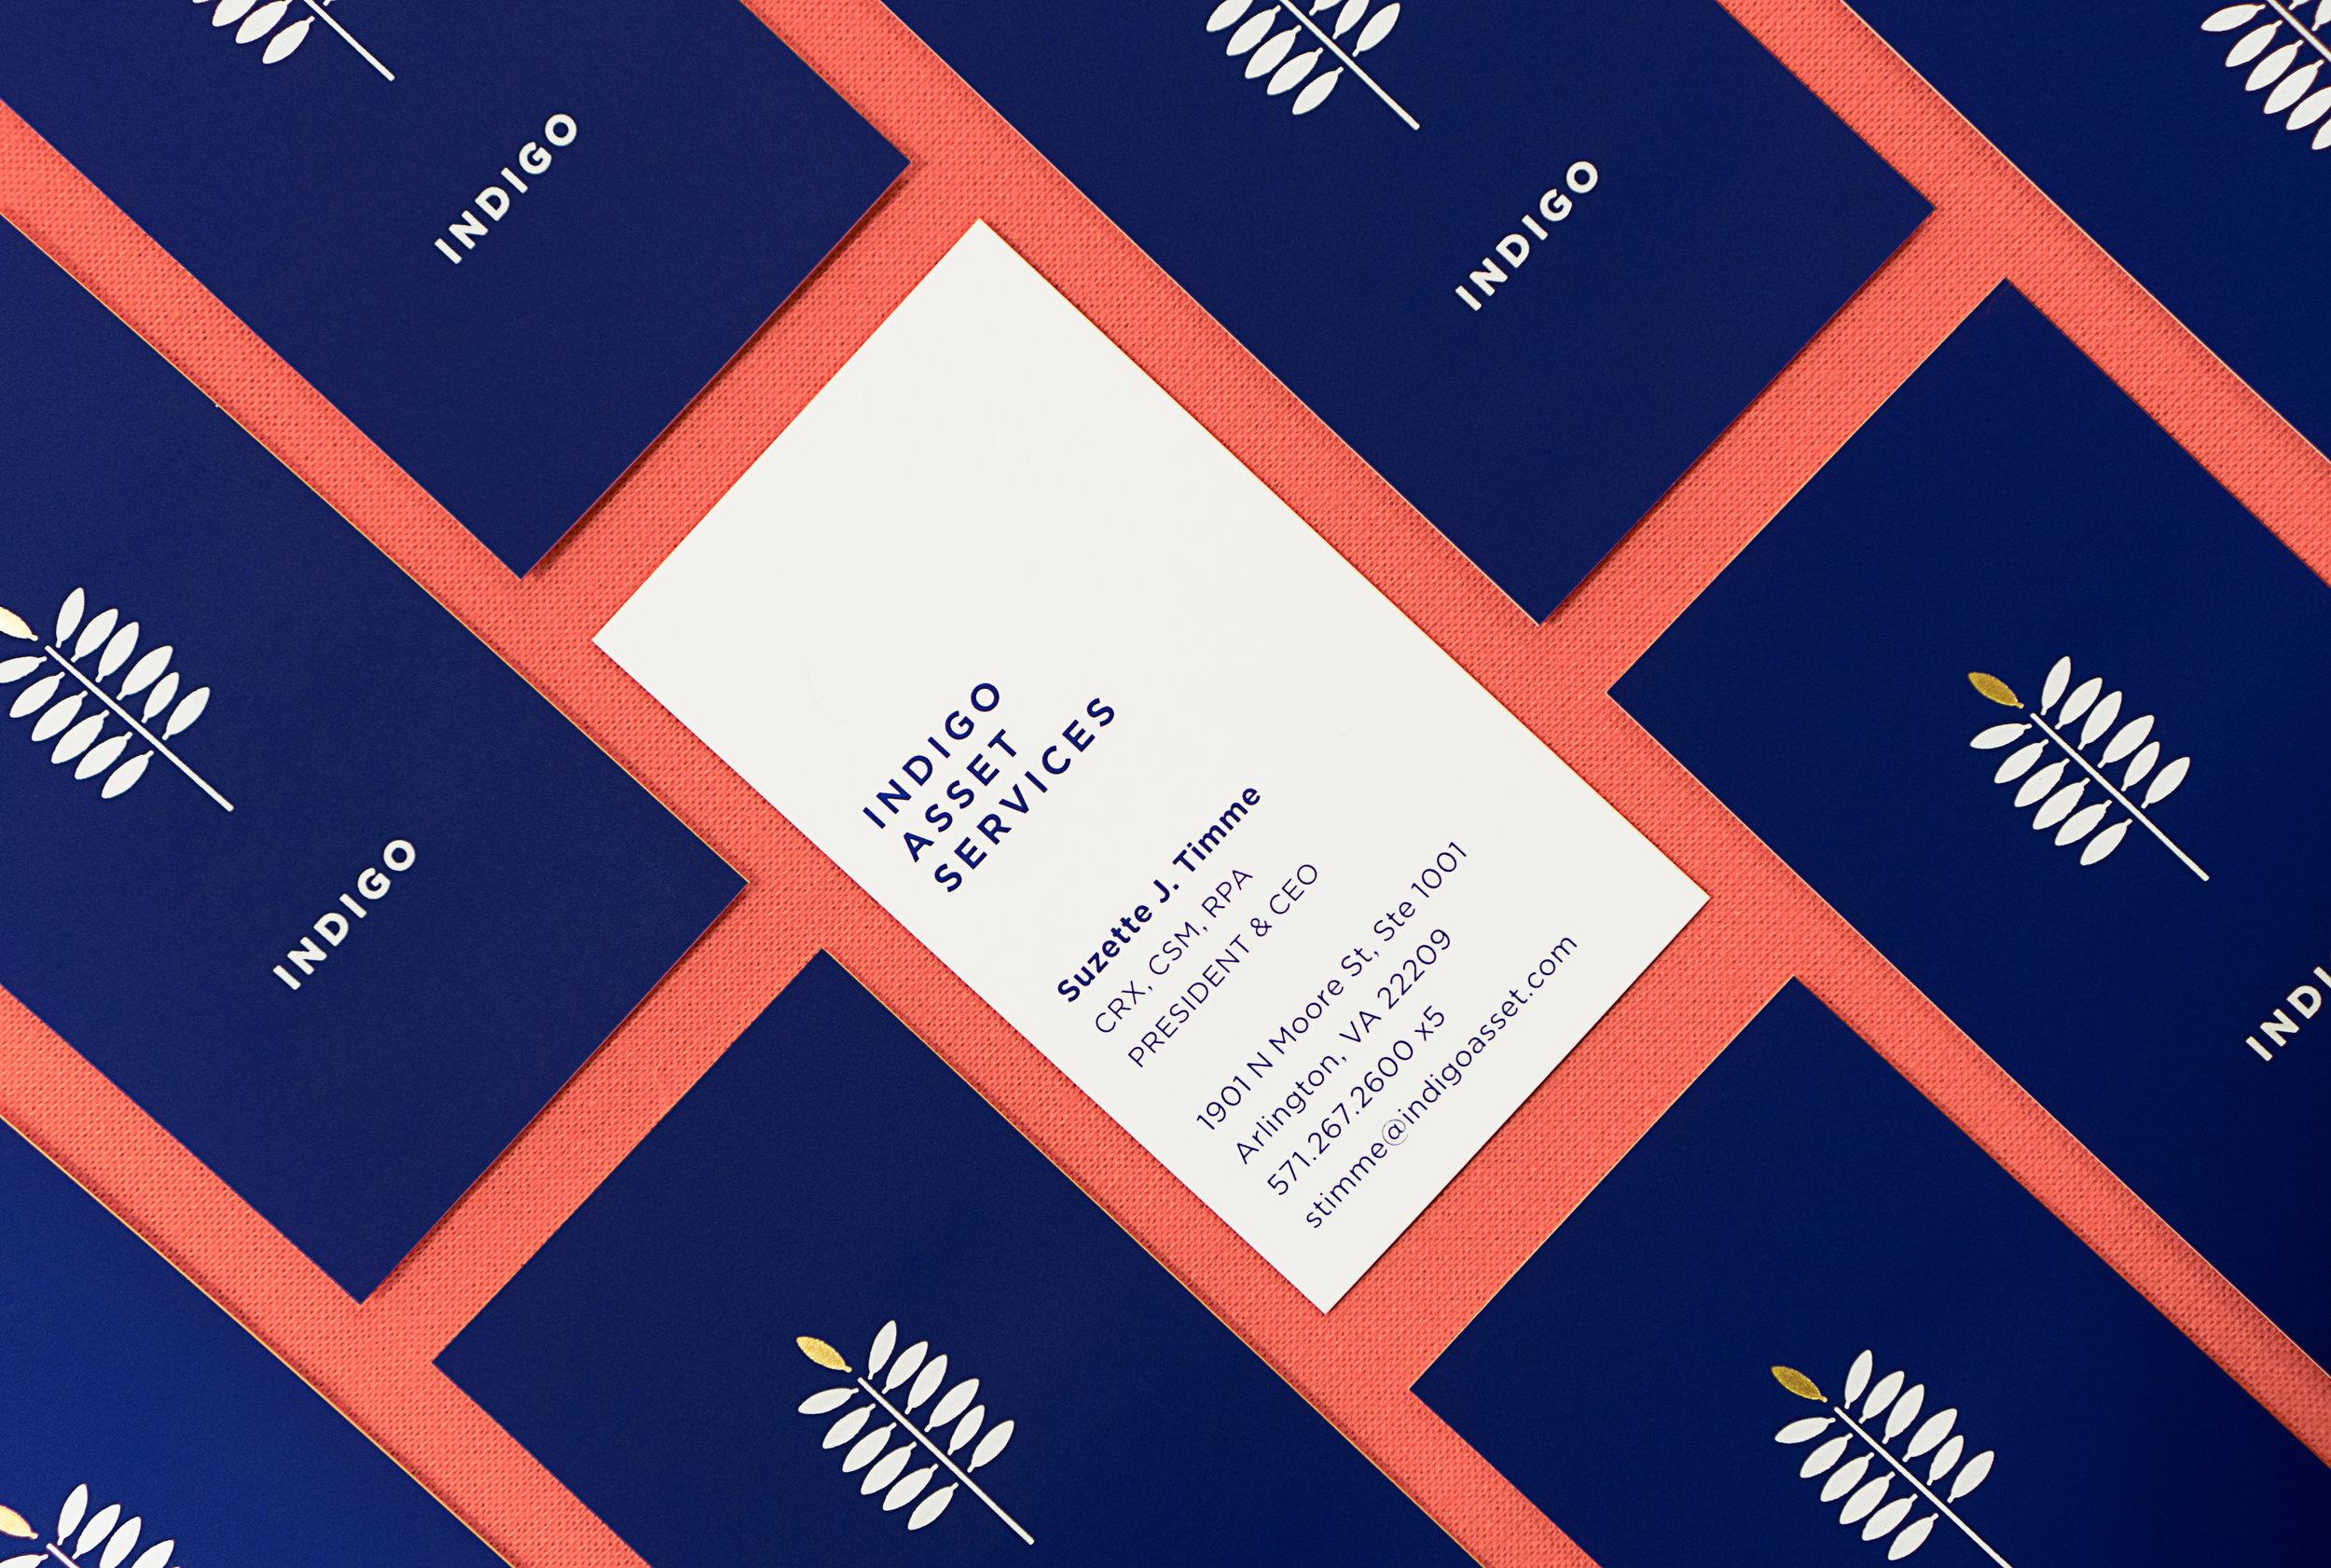 Business Cards_Tile.jpg